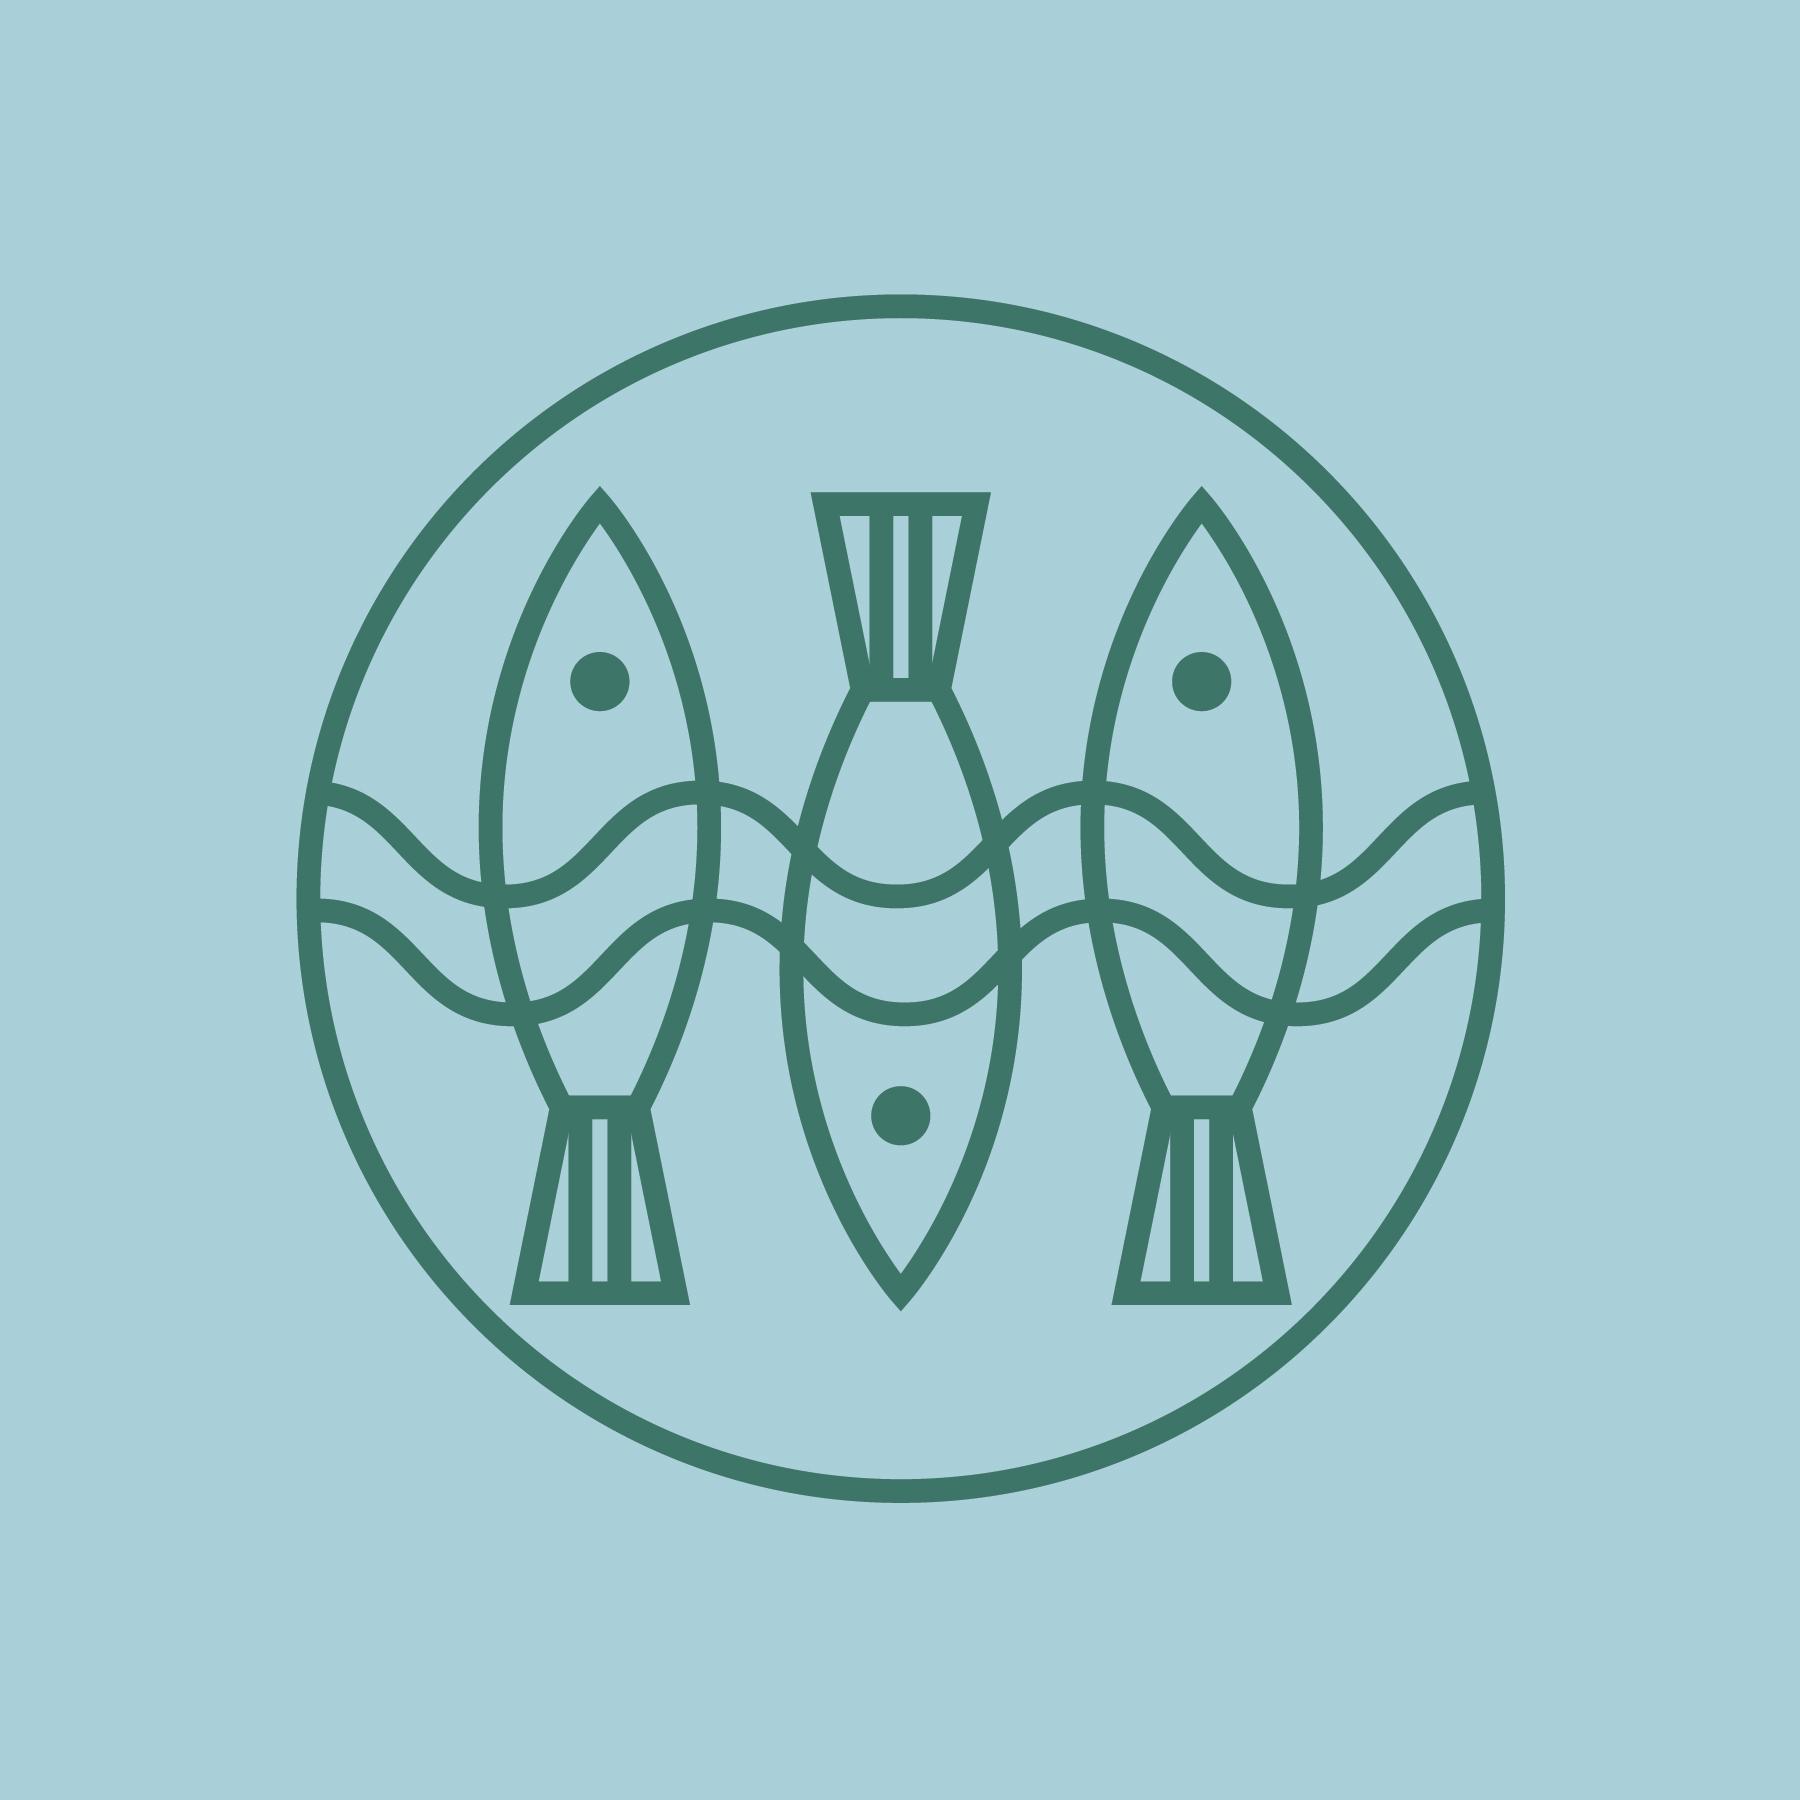 3fishlogo_icon_web_blue.jpg